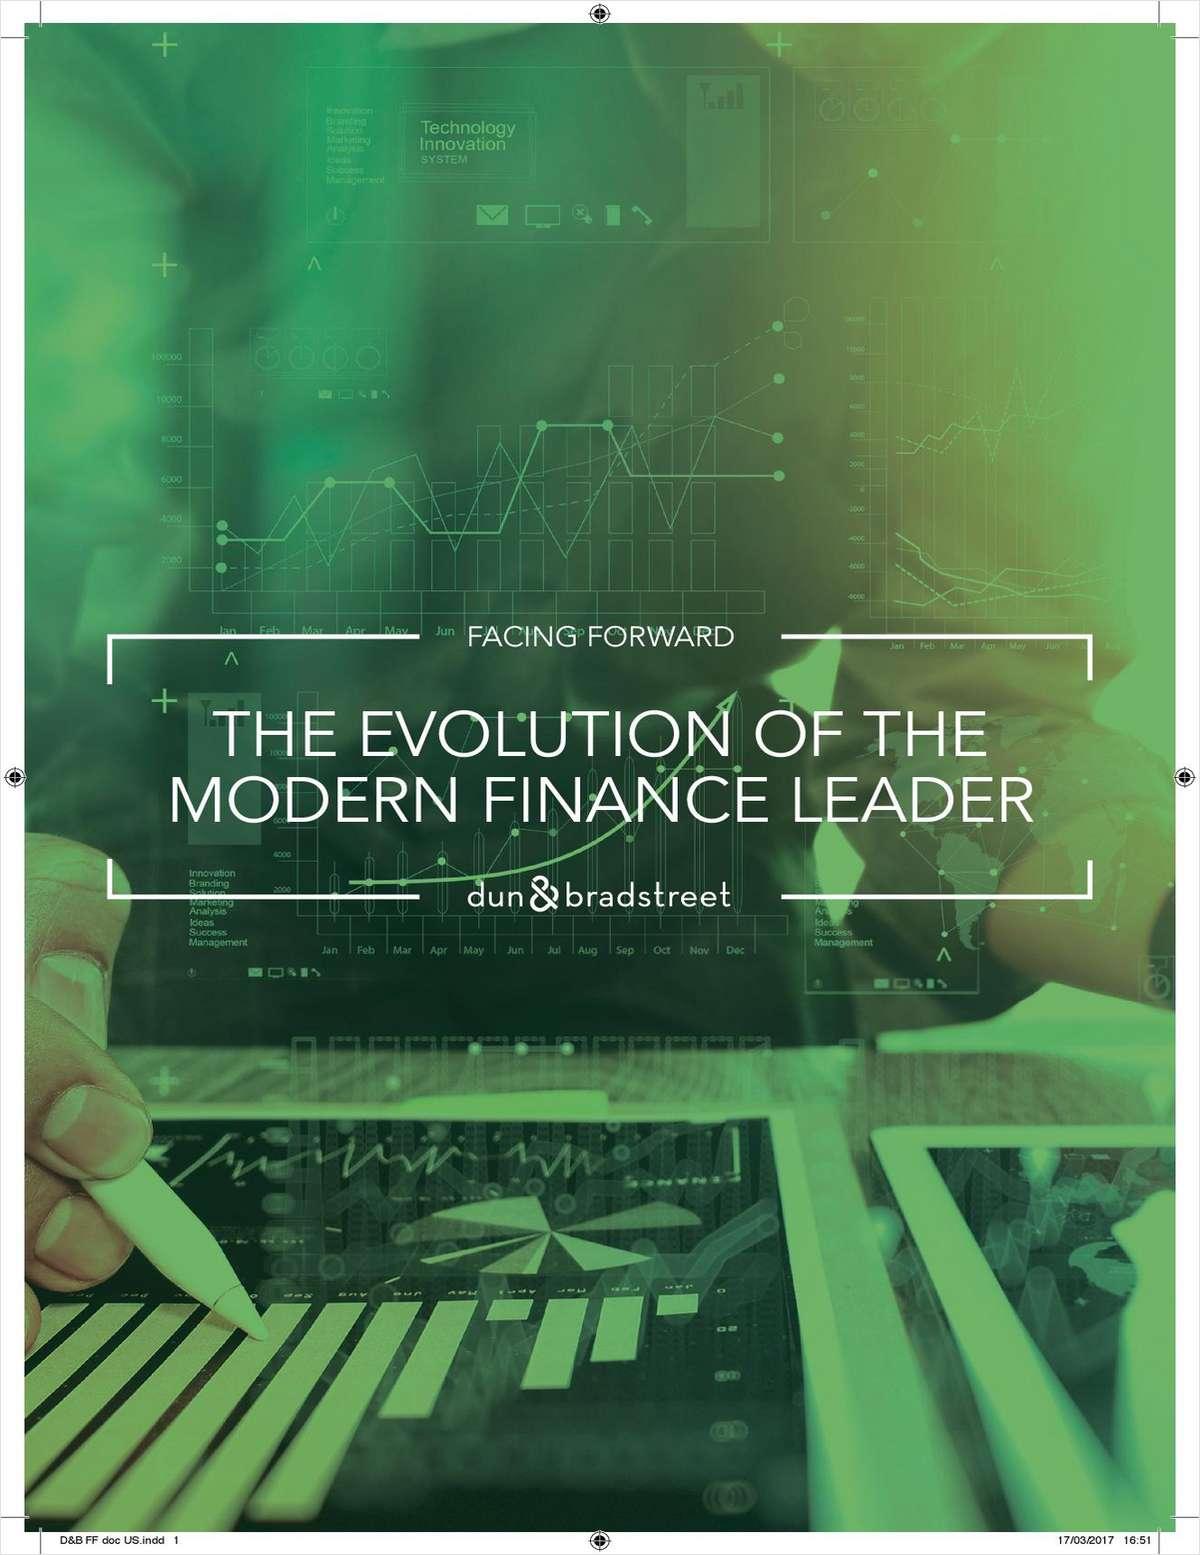 Facing Forward: The Evolution of the Modern Finance Leader